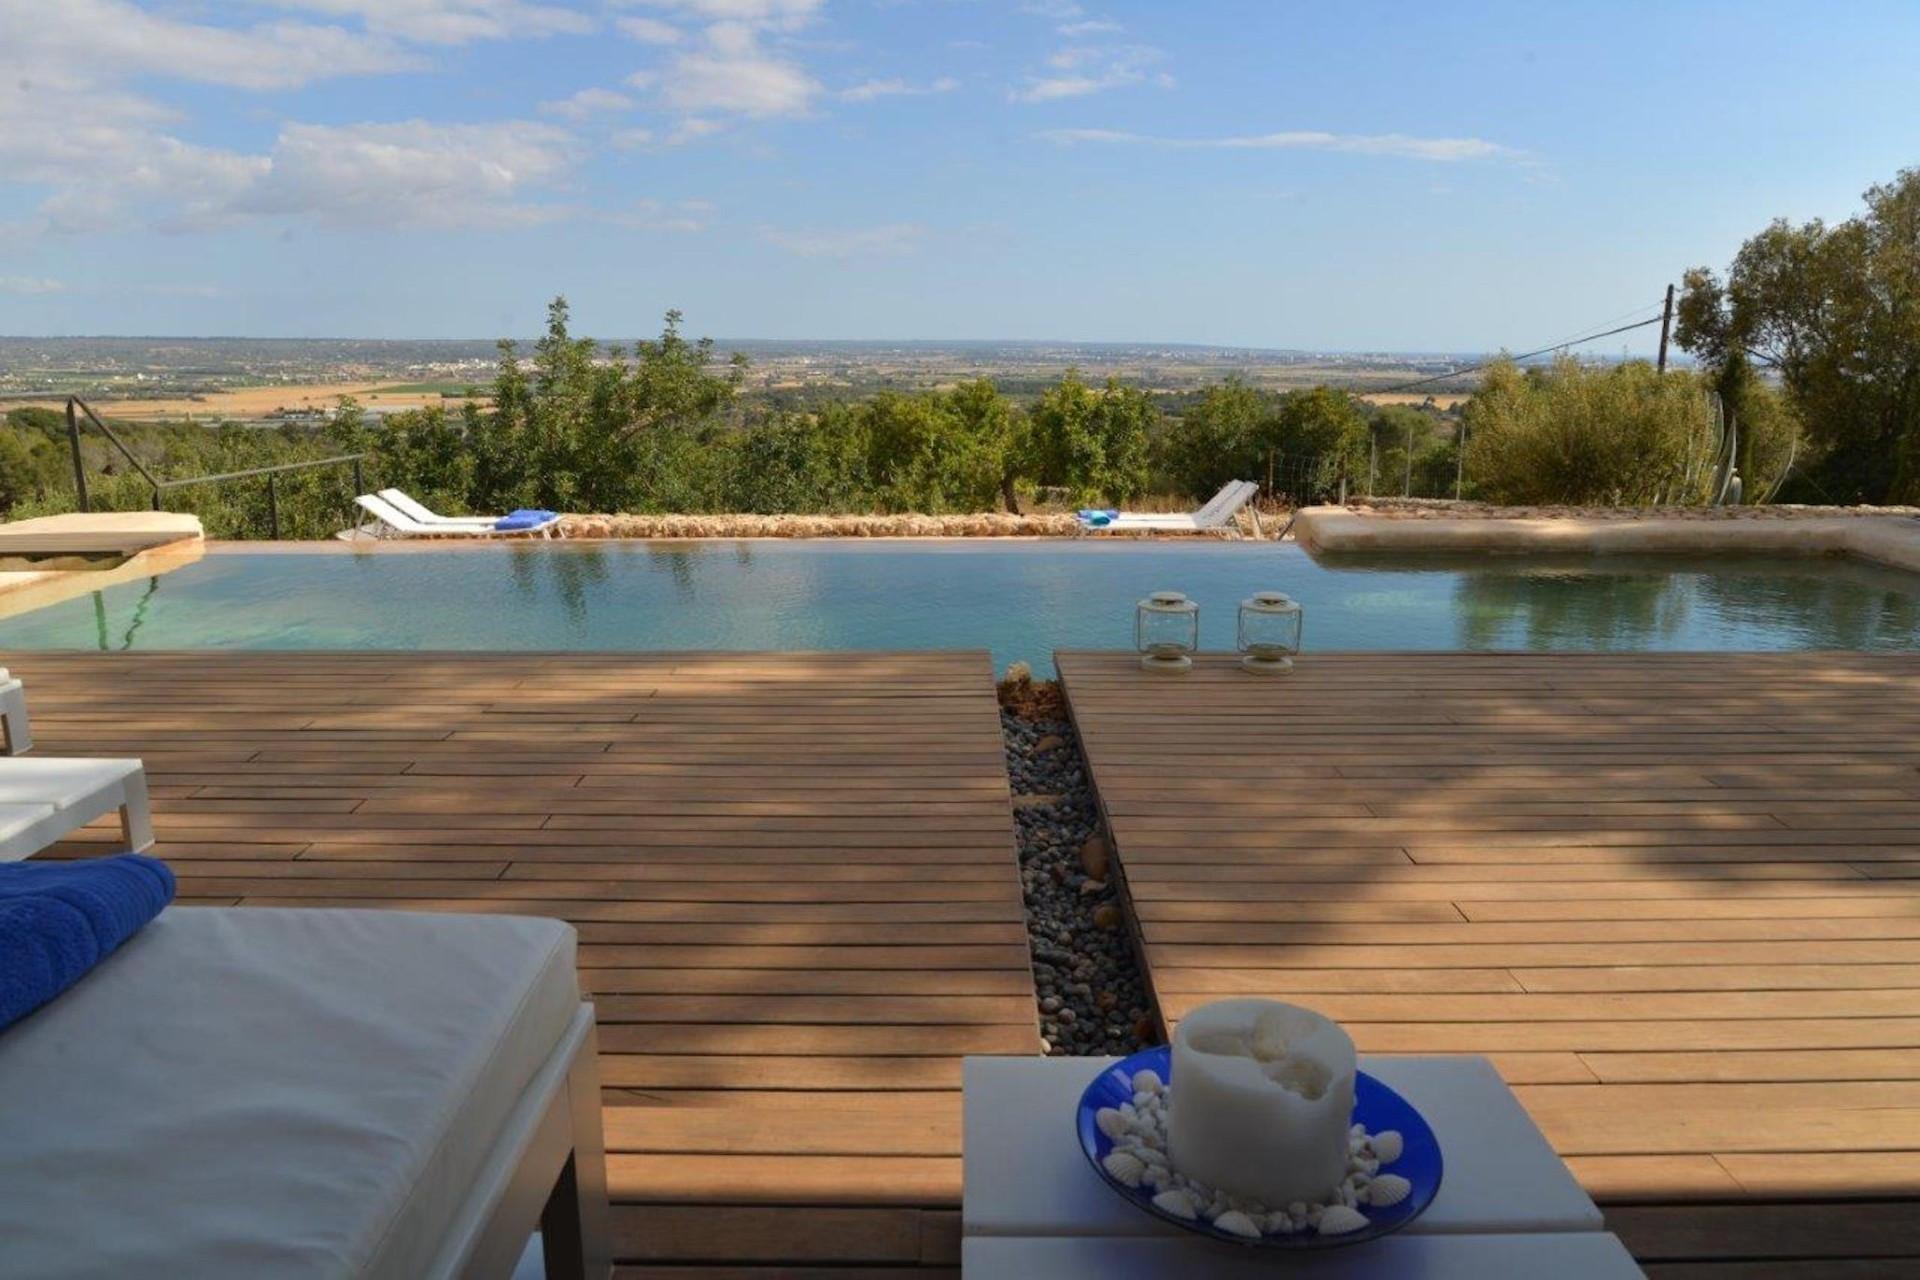 6 Bedroom Villa Palma Luxury Villa Close to Palma With Infinity Pool